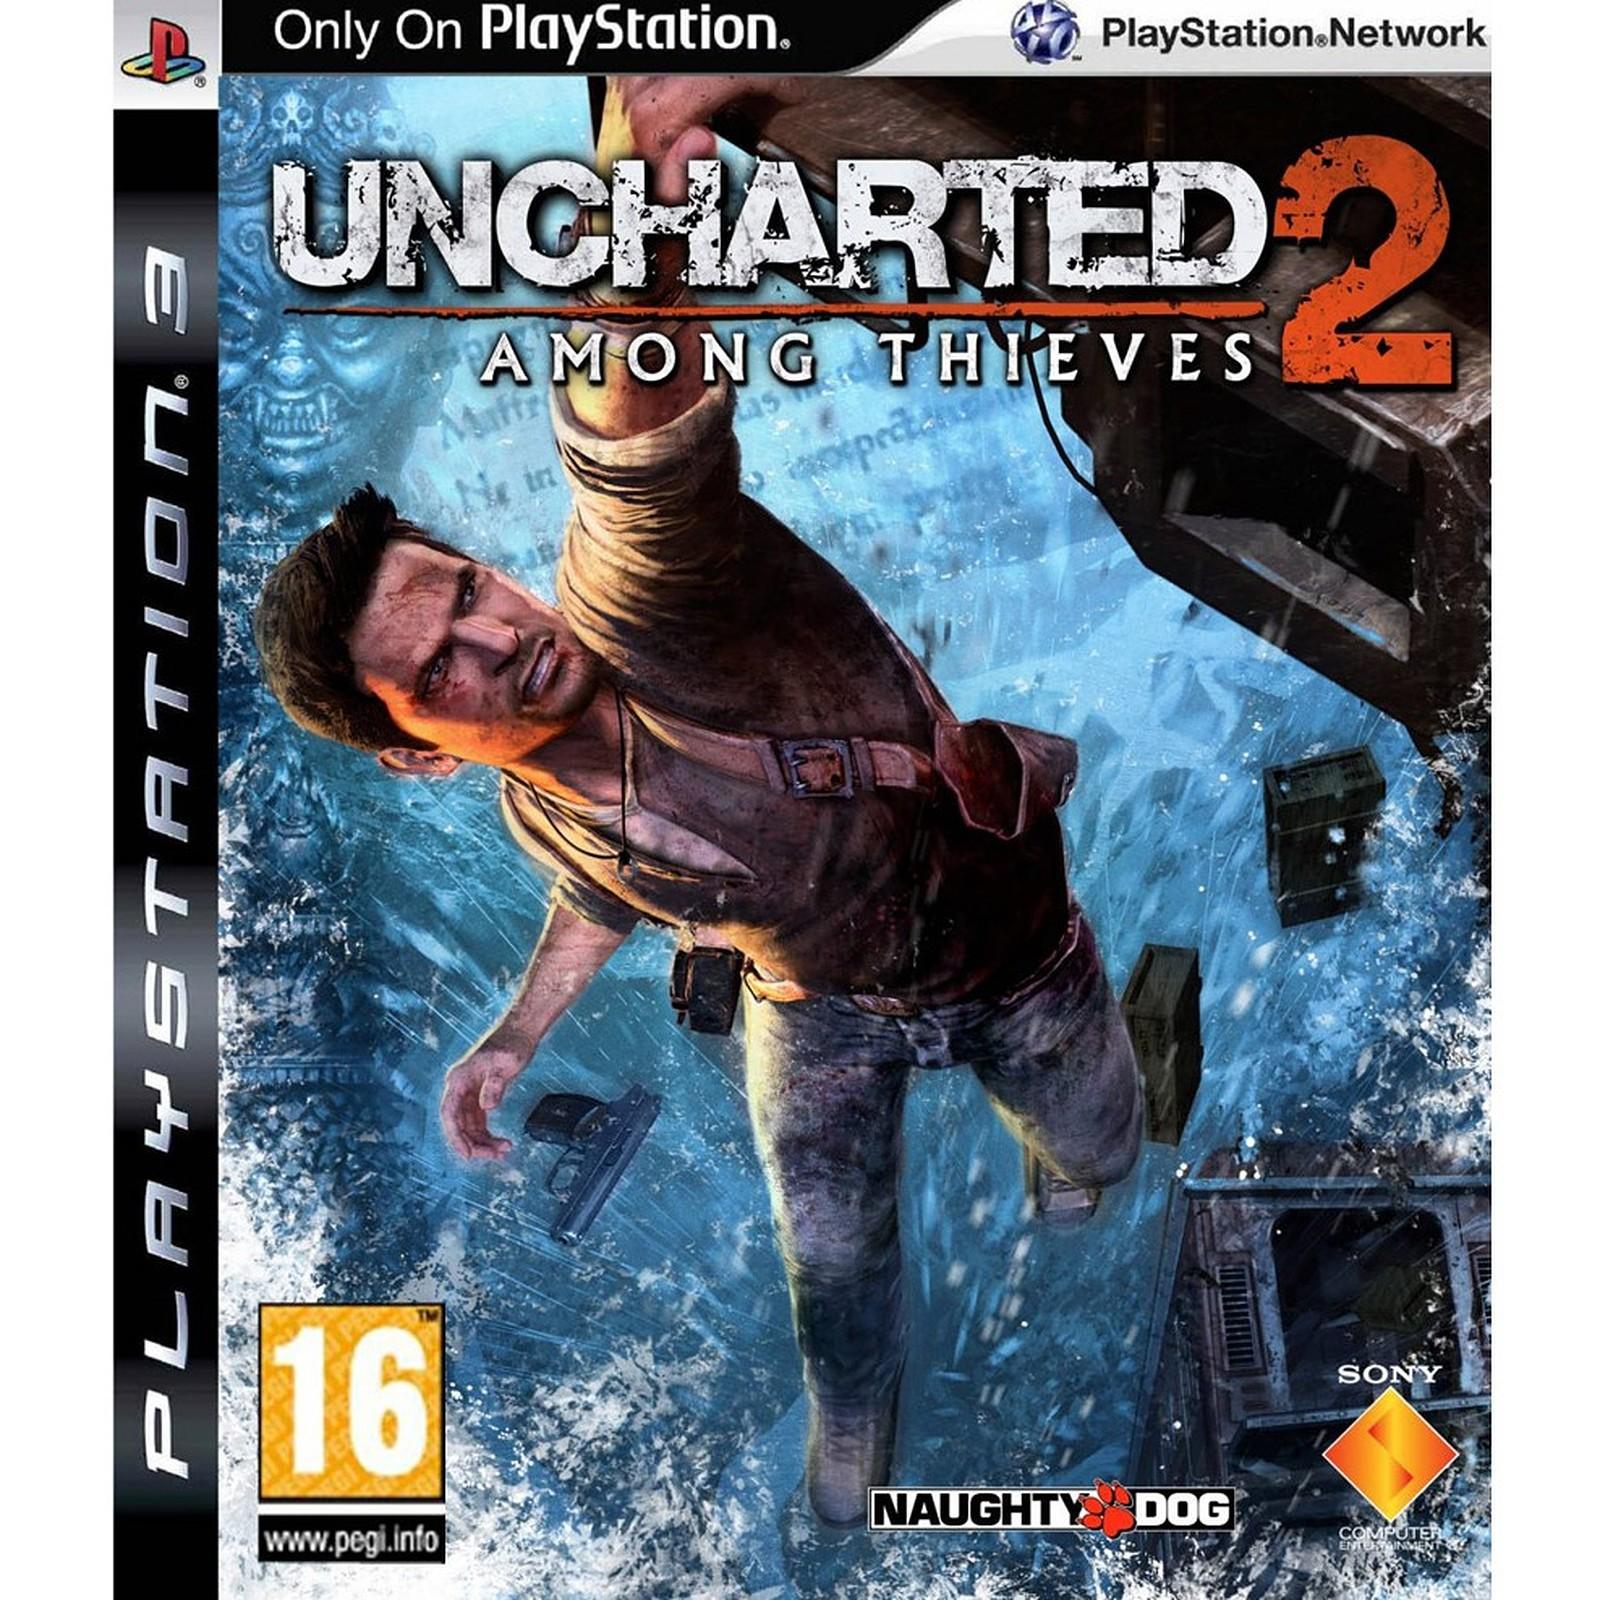 Uncharted 2 Among Thieves | Uncharted 2 Серед крадіїв б/в PS3